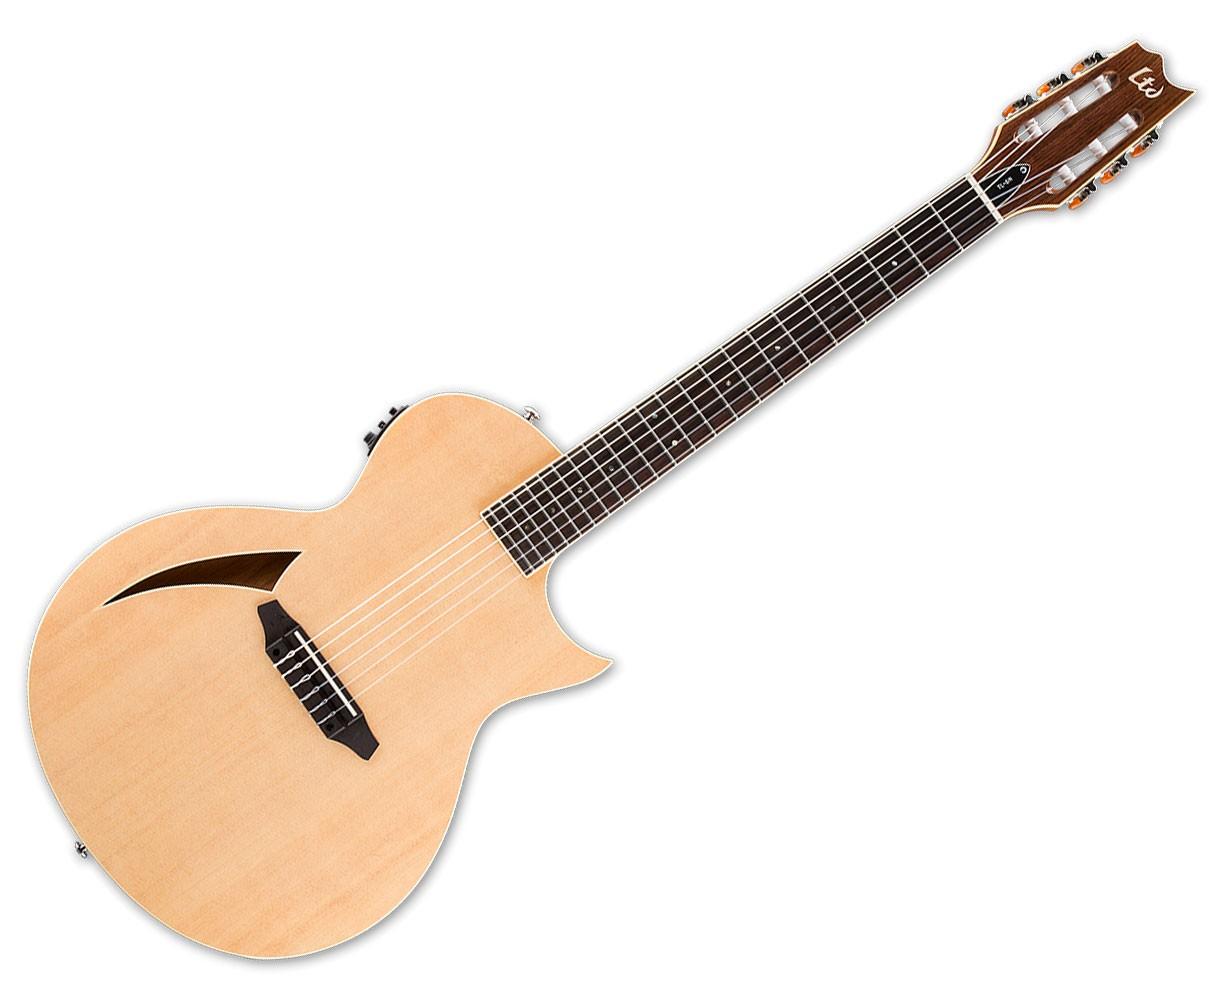 ESP TL-6S Nylon 6-String Acoustic Guitar - Natural